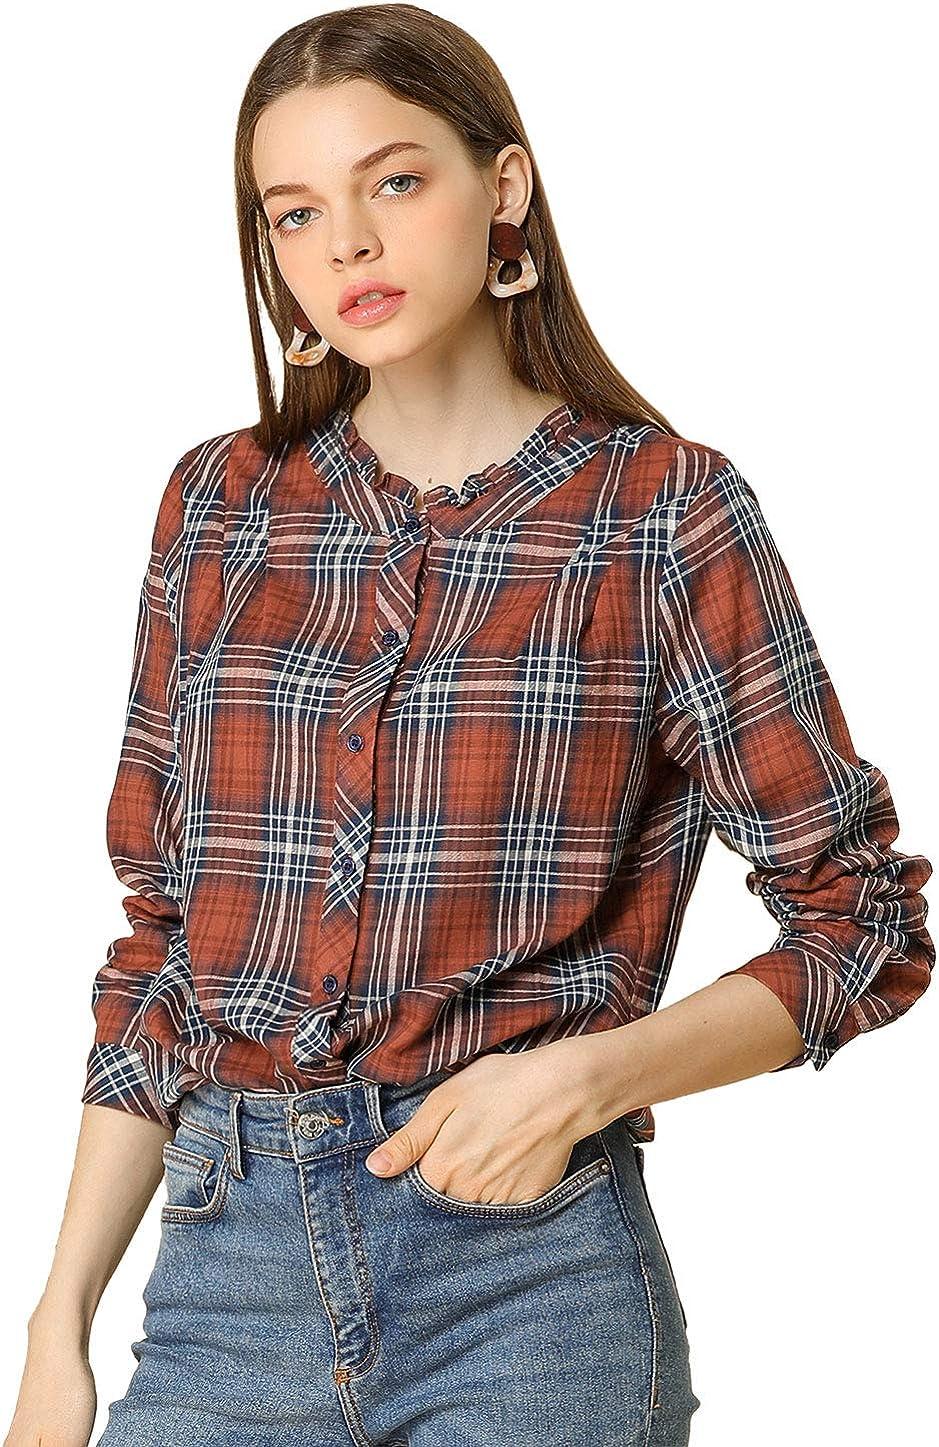 Allegra K Wholesale Women's Button Up Blouse Neck Sleeve Long P Max 59% OFF Top Ruffle